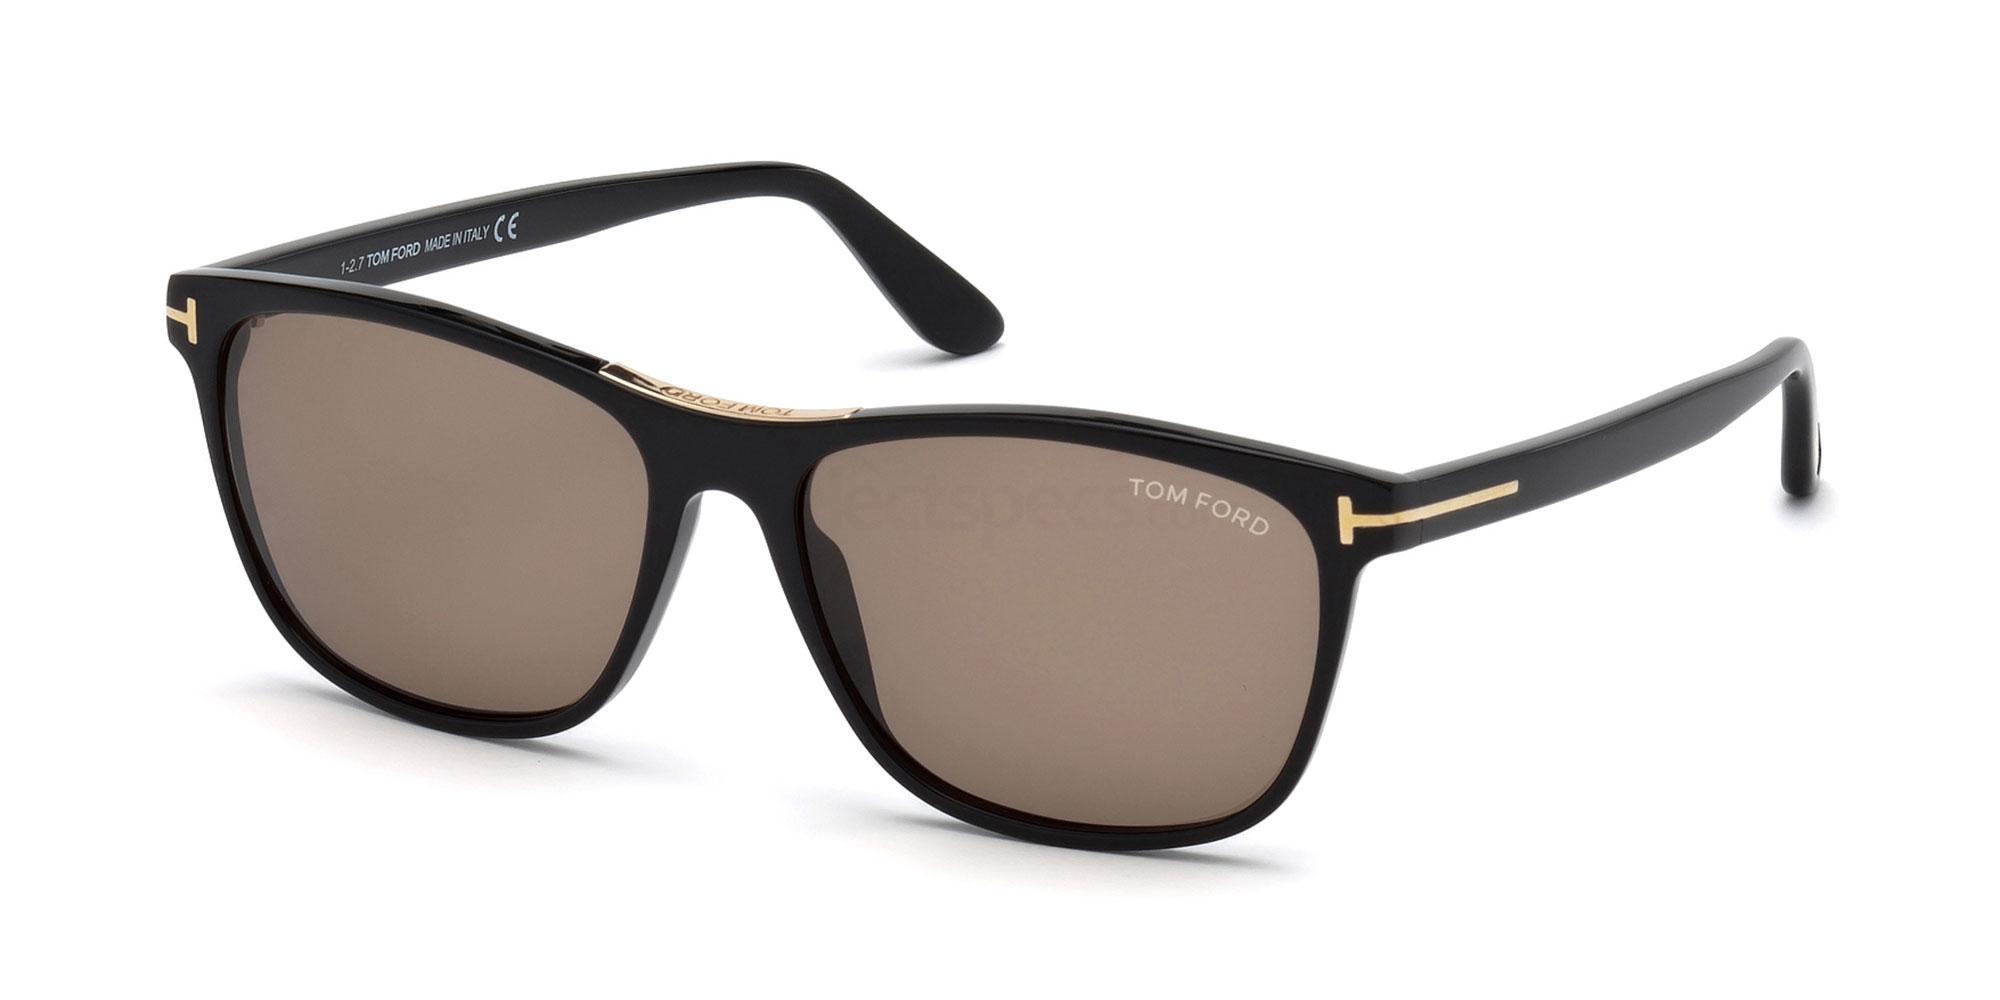 01A FT0629 Sunglasses, Tom Ford